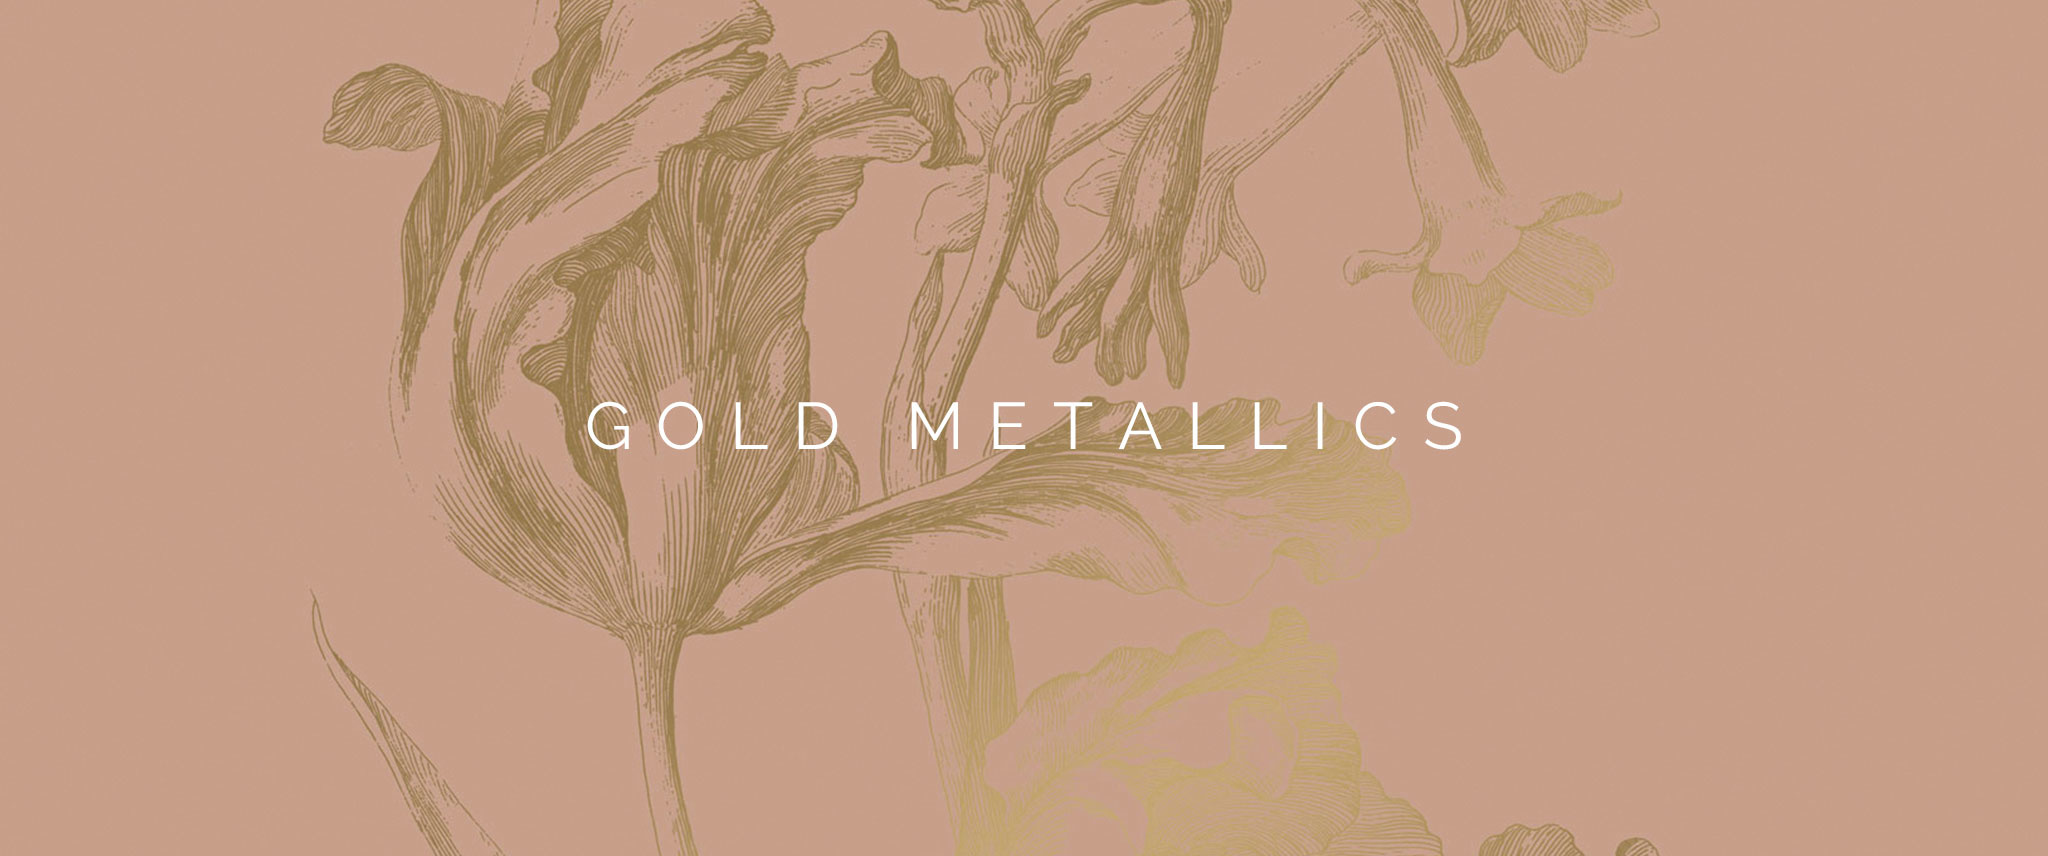 Behang Gold Metallics